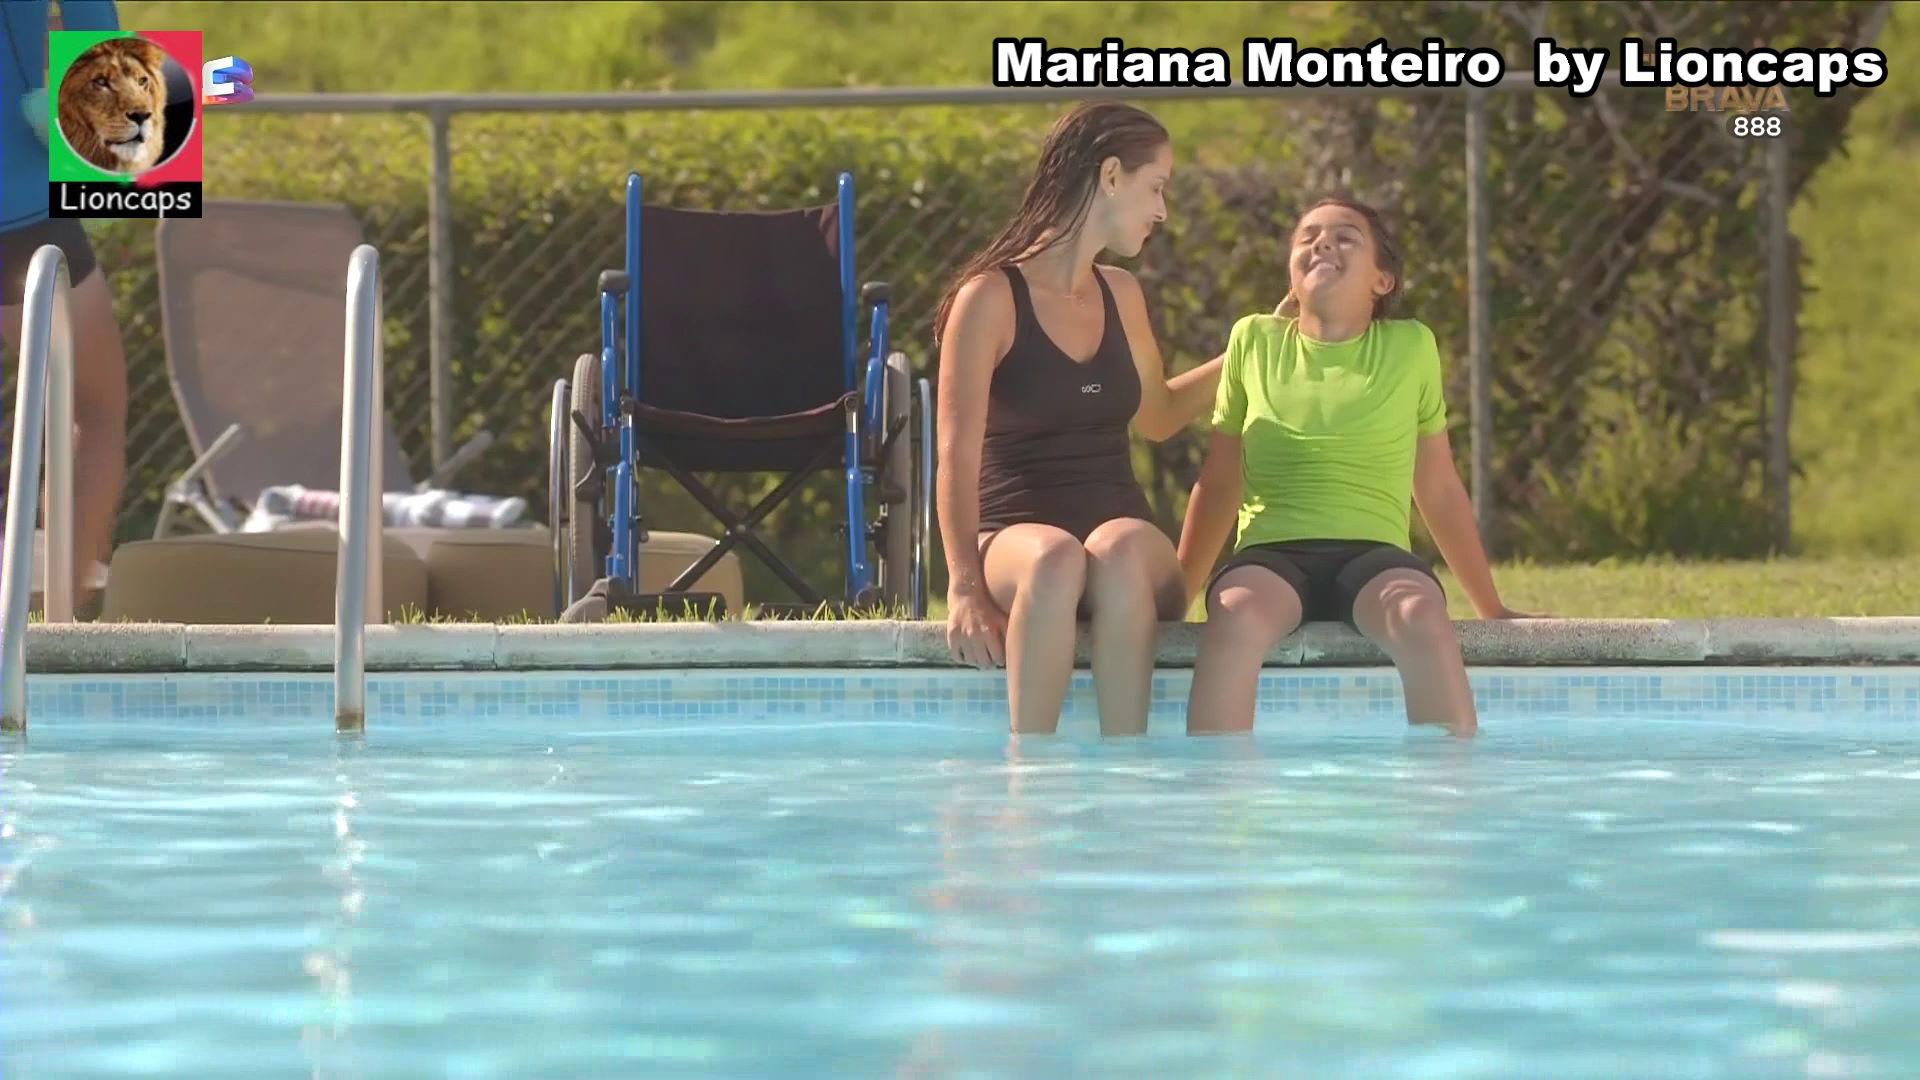 634939290_mariana_monteiro_vs191124_2719_122_184lo.JPG